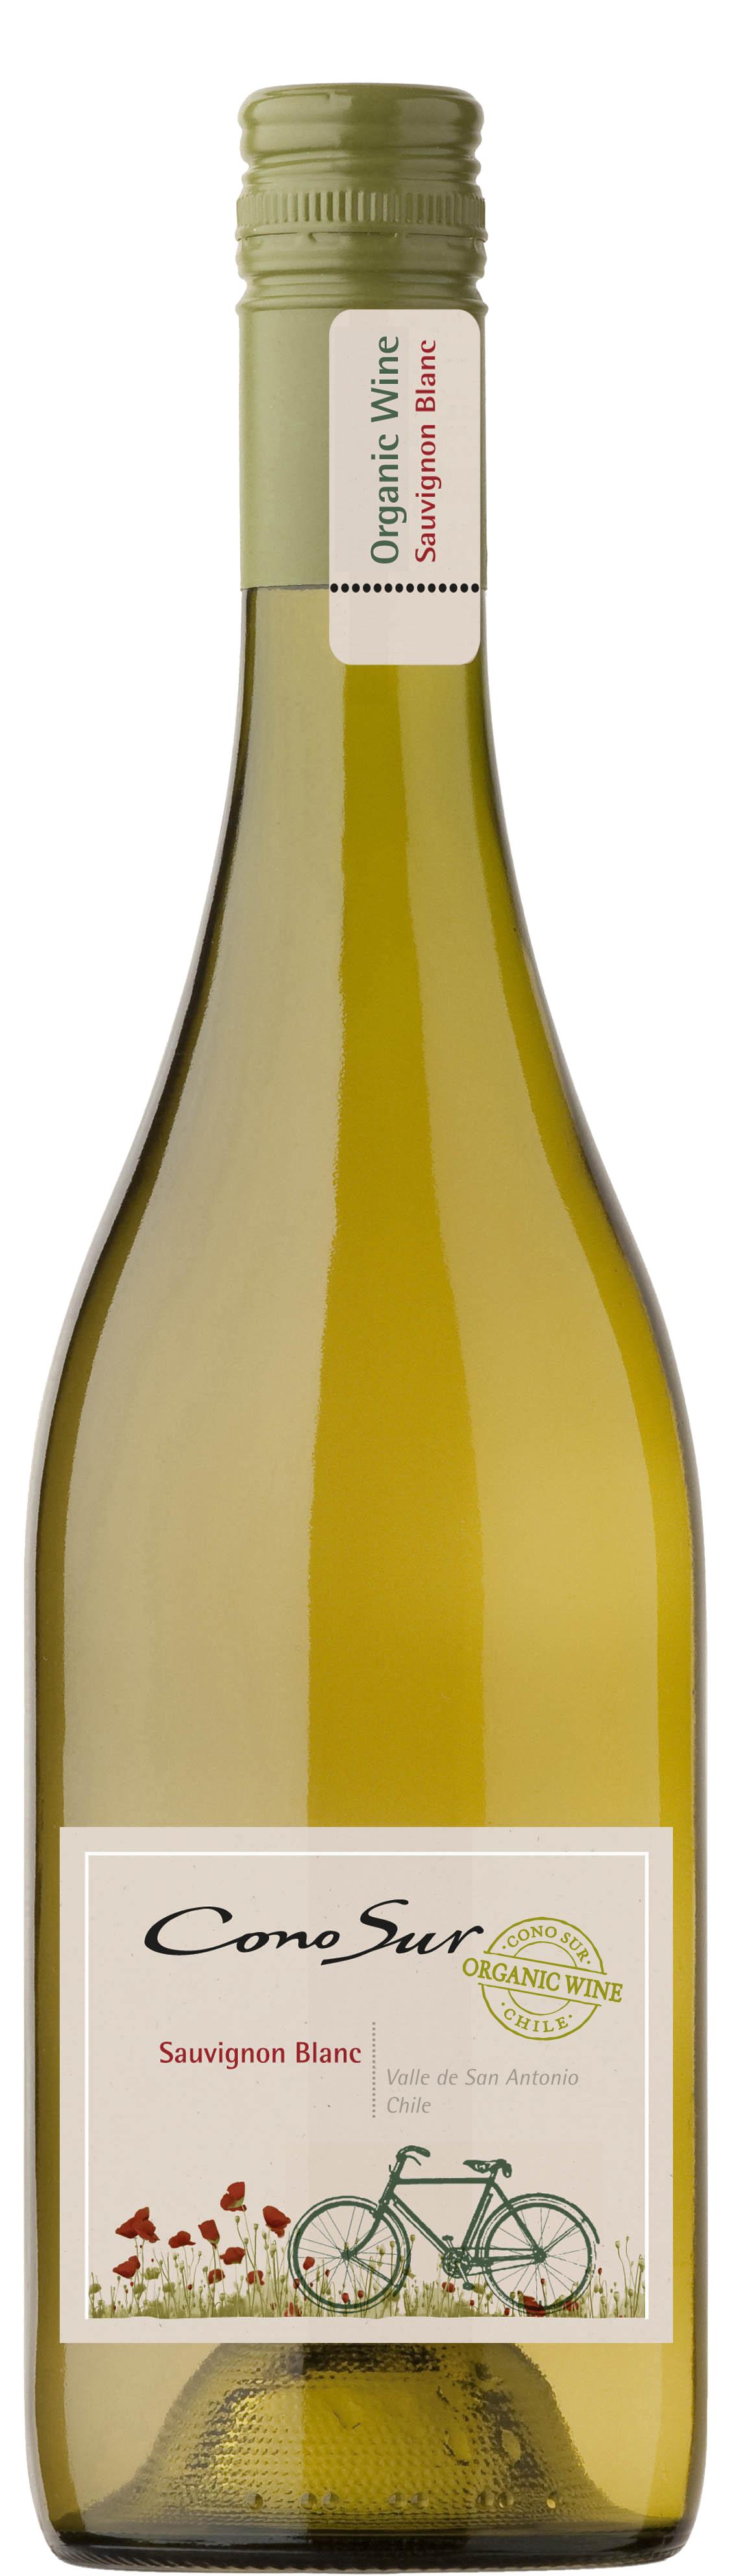 Cono Sur Organic Sauvignon Blanc Bottle.jpg